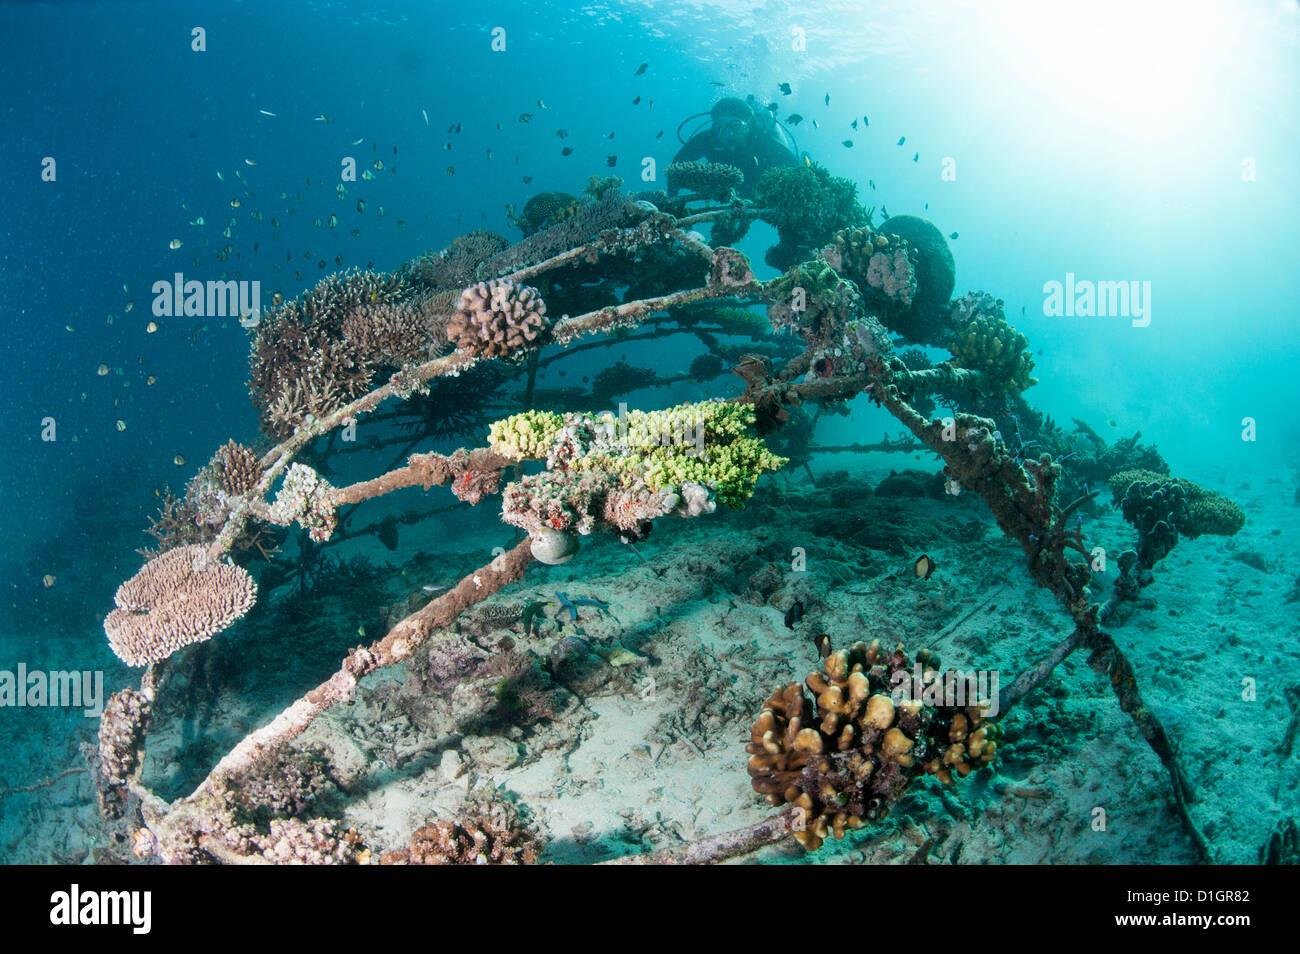 Korallen verkrustet Biosphäre im Meeresschutzgebiet Gangga Island, Sulawesi, Indonesien, Südostasien, Stockbild